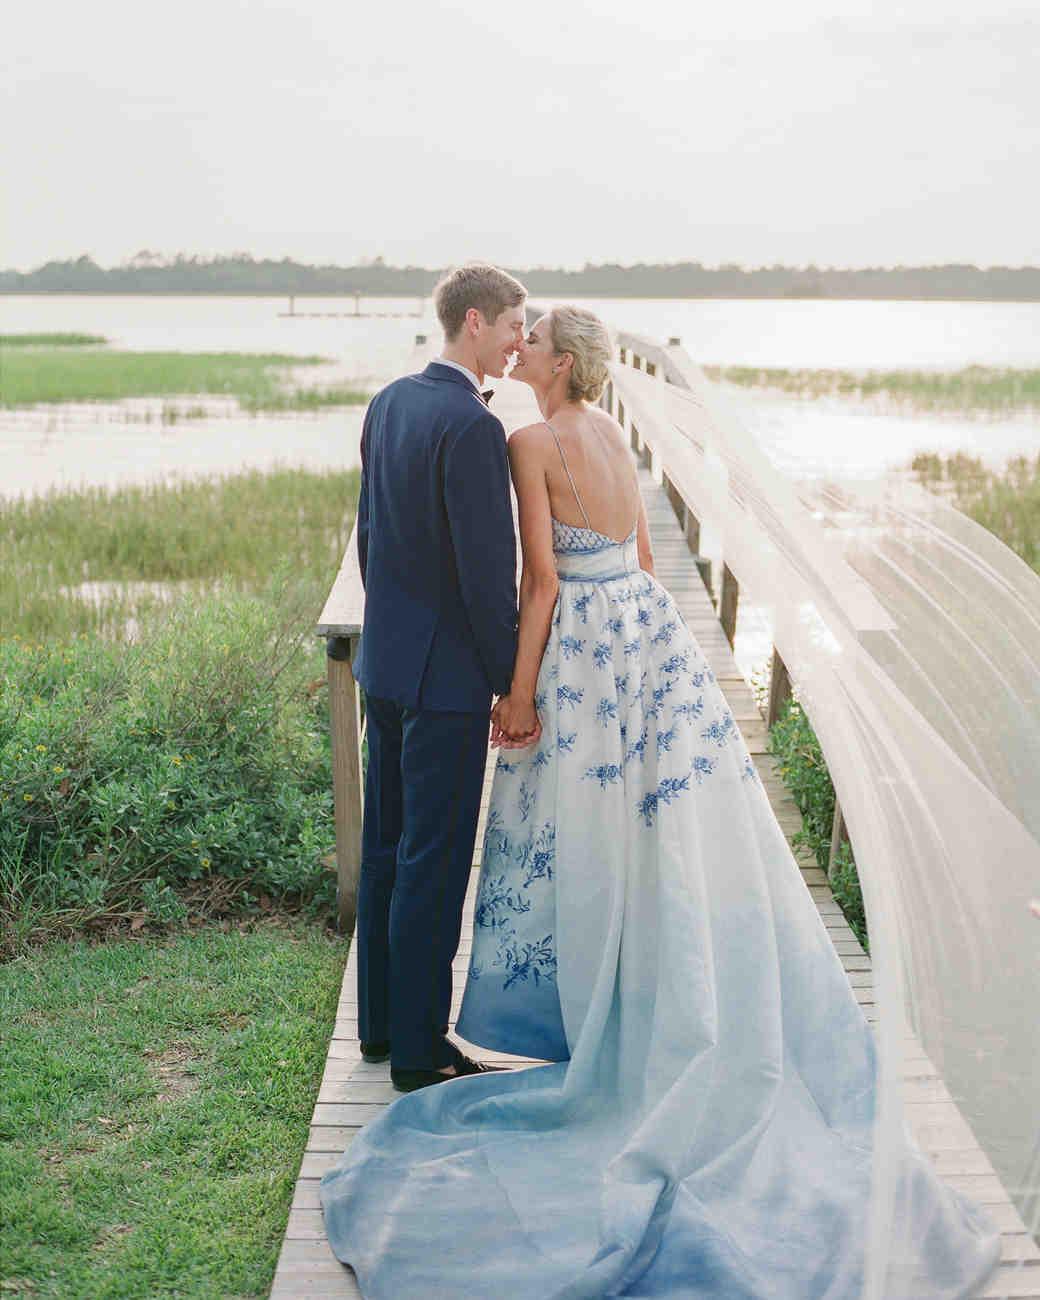 Colorful Wedding Dresses We Love